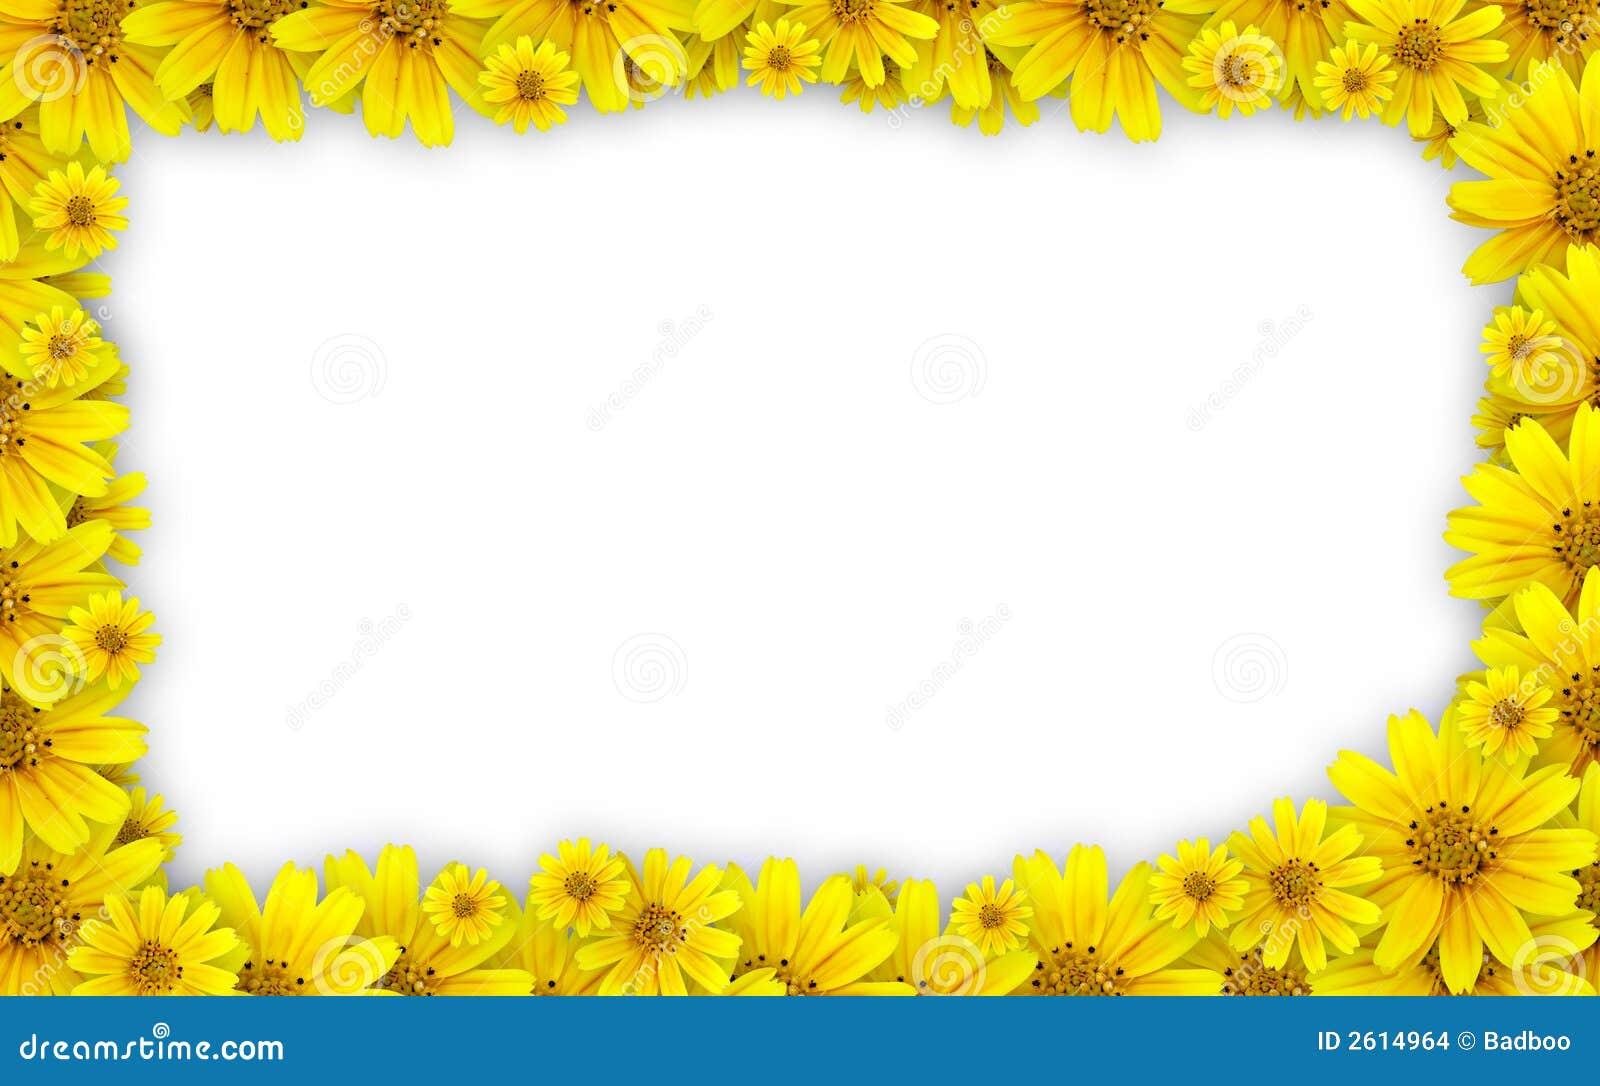 Flower frame - coreopsis lanceolata (tickseed) used for floral frame ...